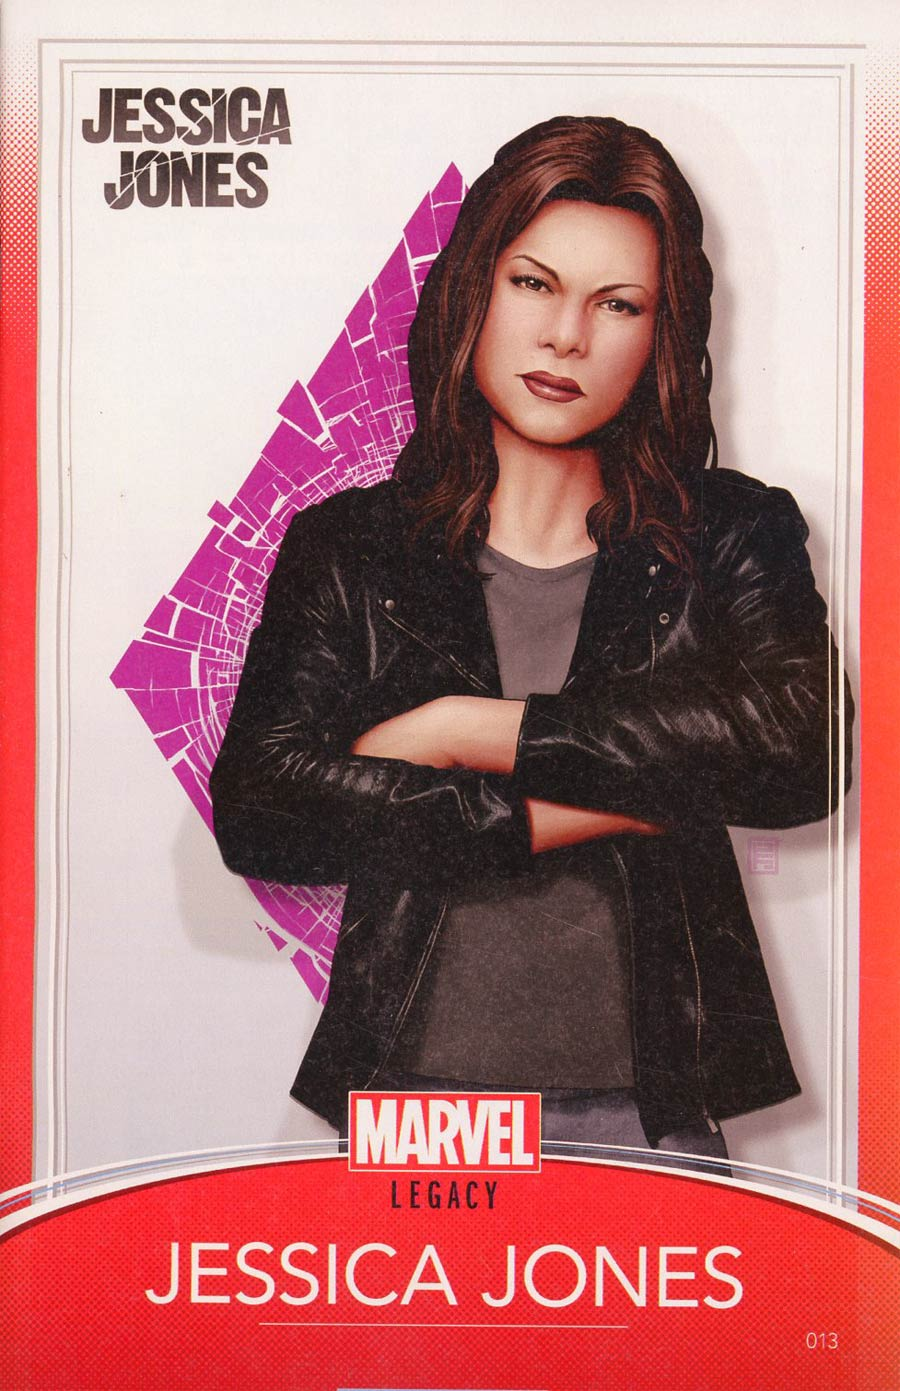 Jessica Jones #13 Cover C Variant John Tyler Christopher Trading Card Cover (Marvel Legacy Tie-In)